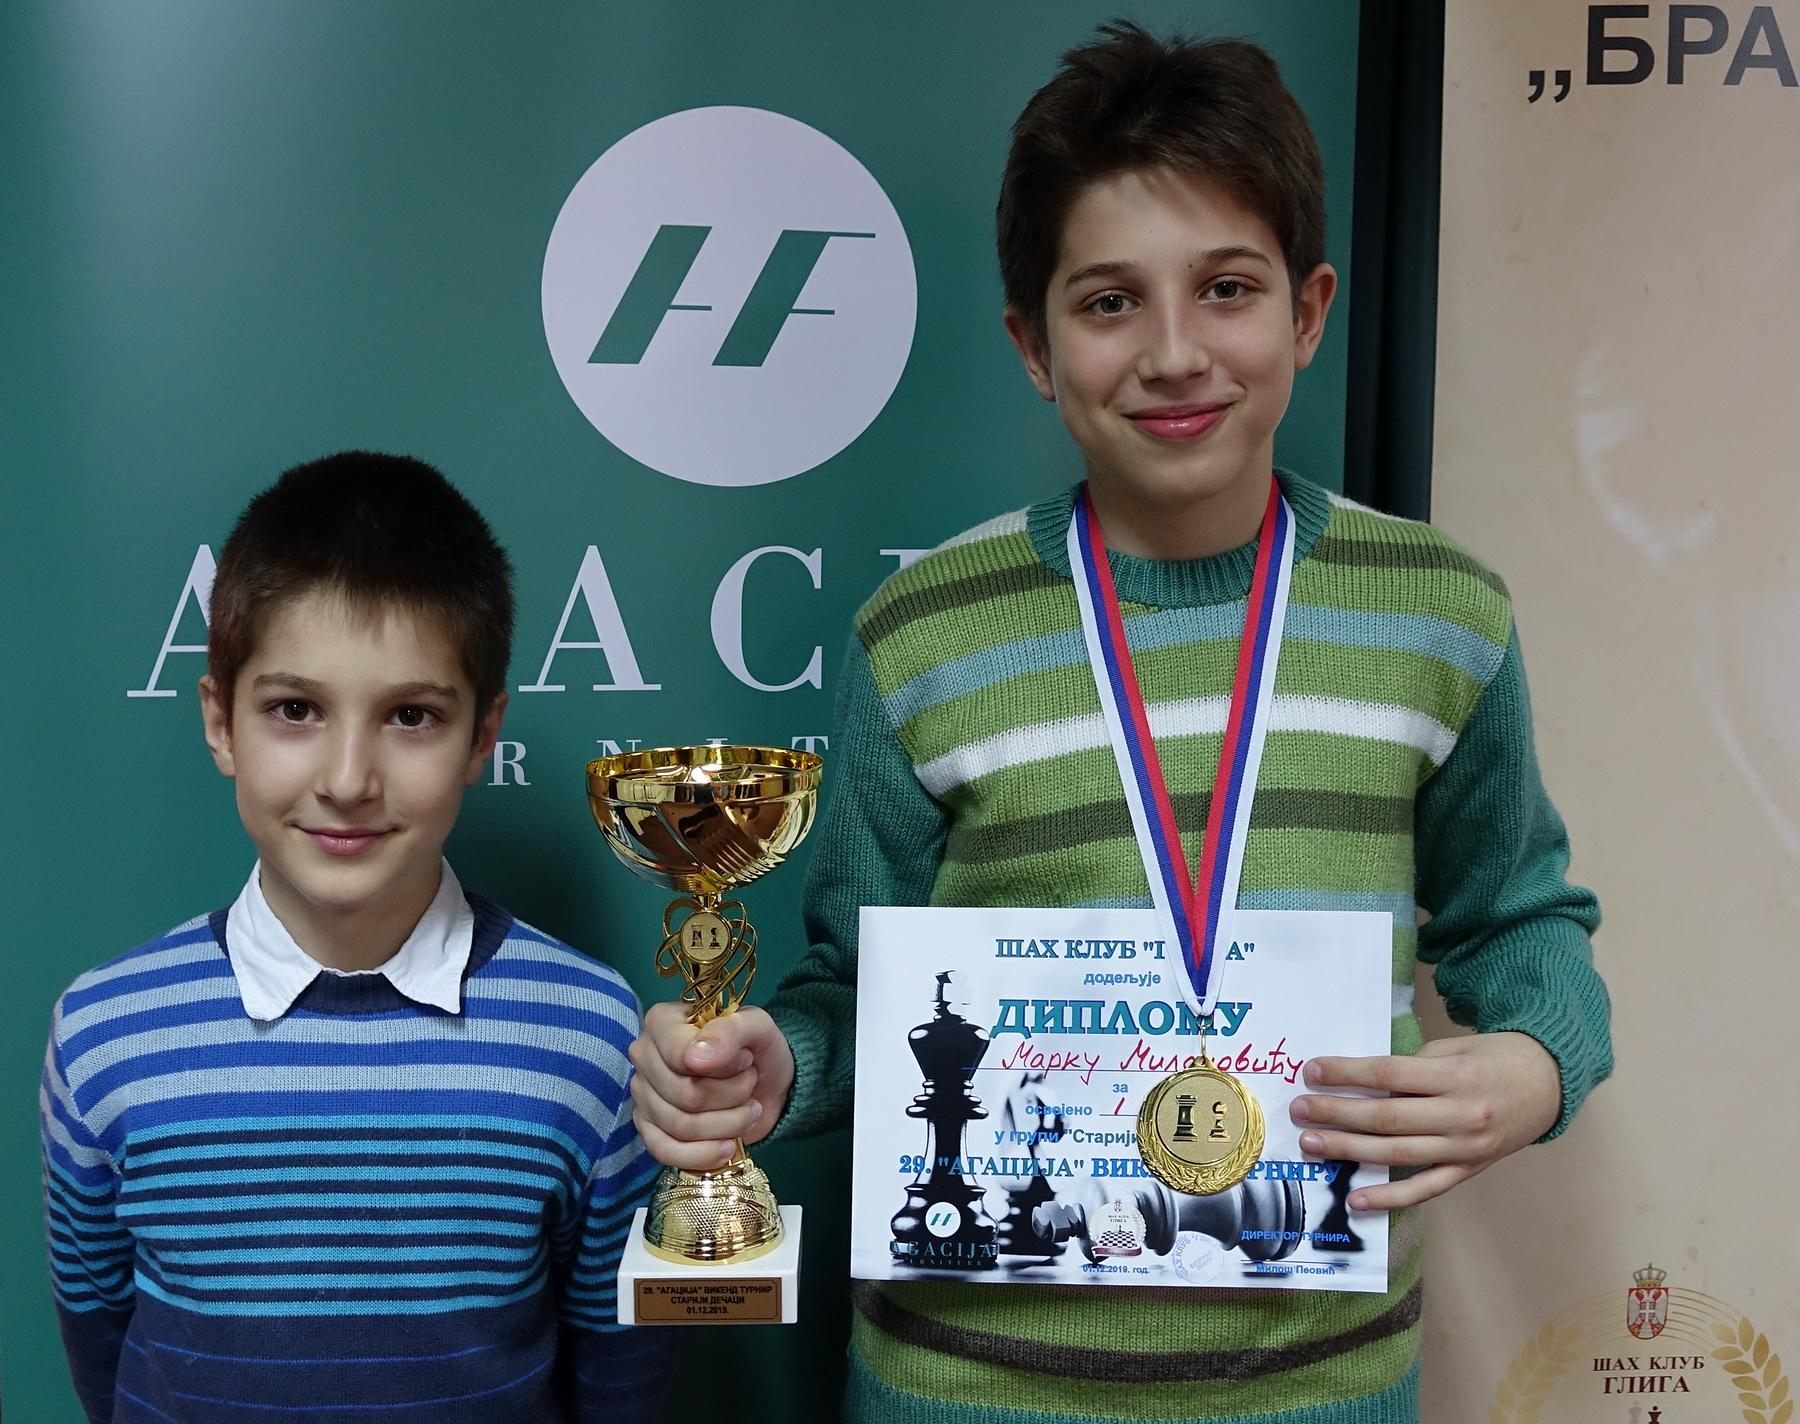 Marko i Pavle Milanović